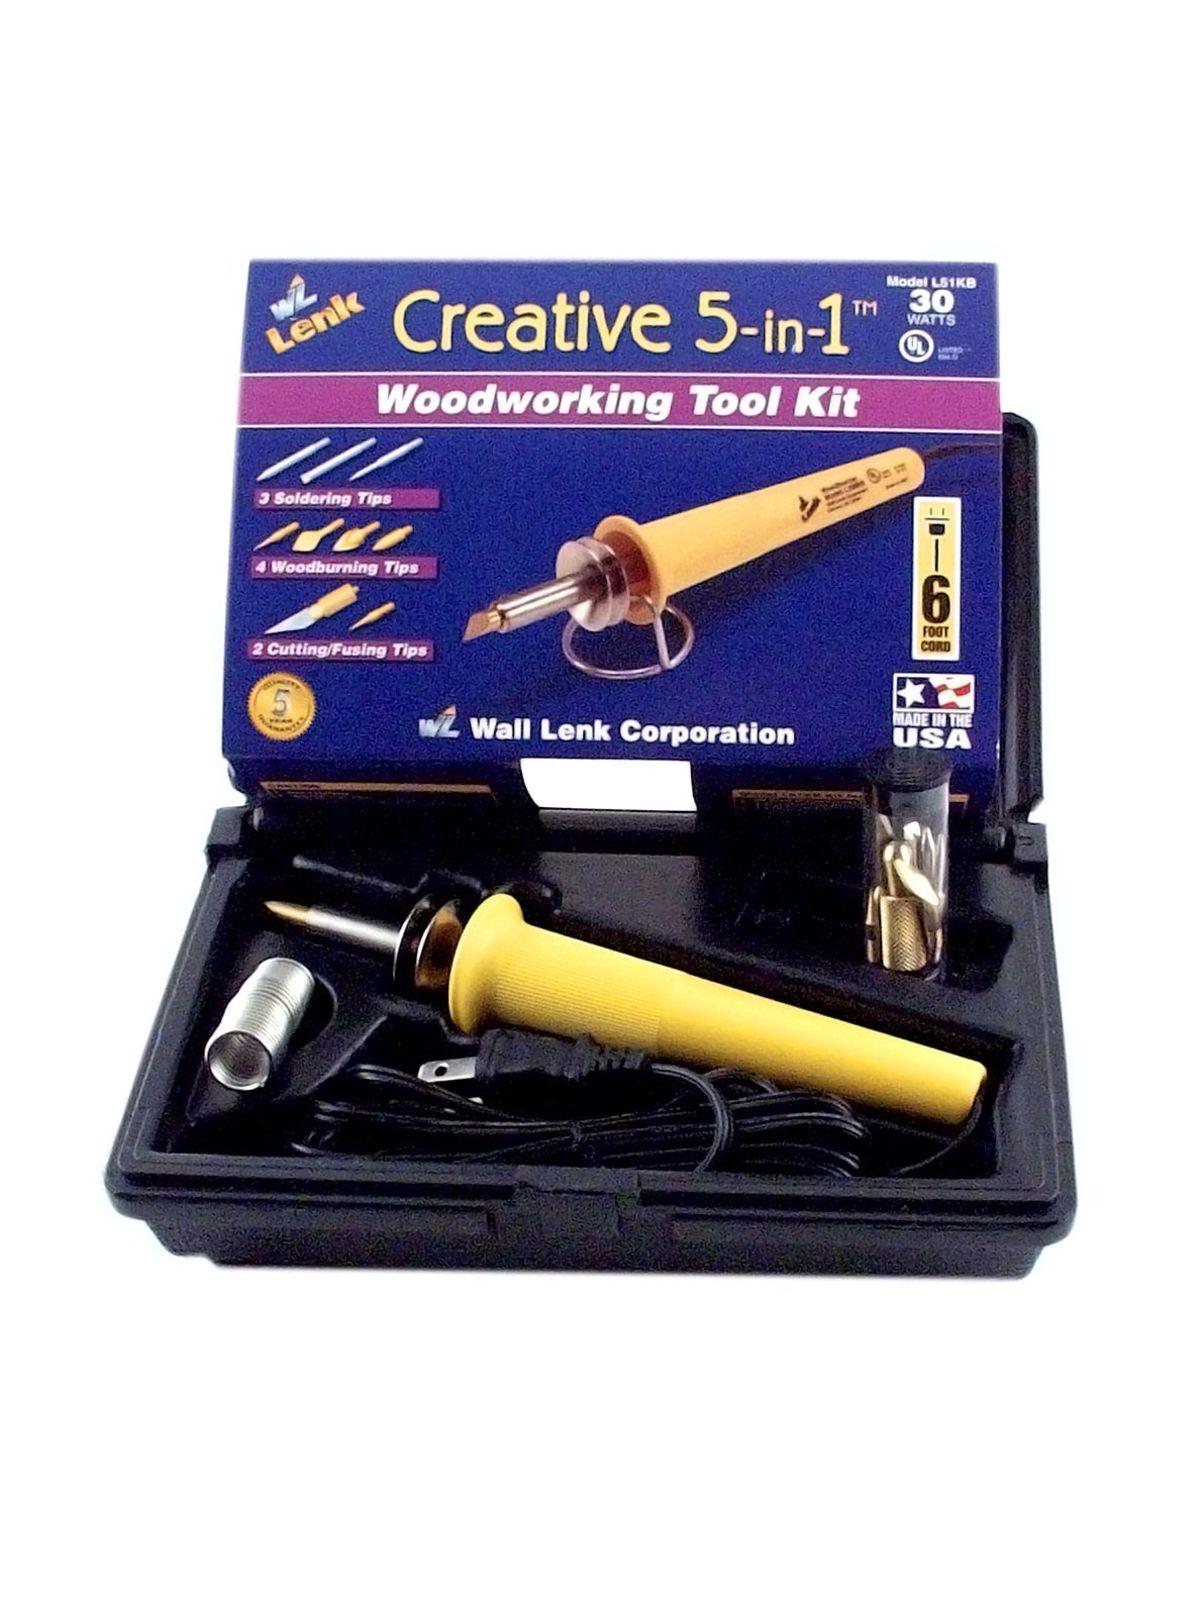 Creative 5 - In - 1 Tool Kit